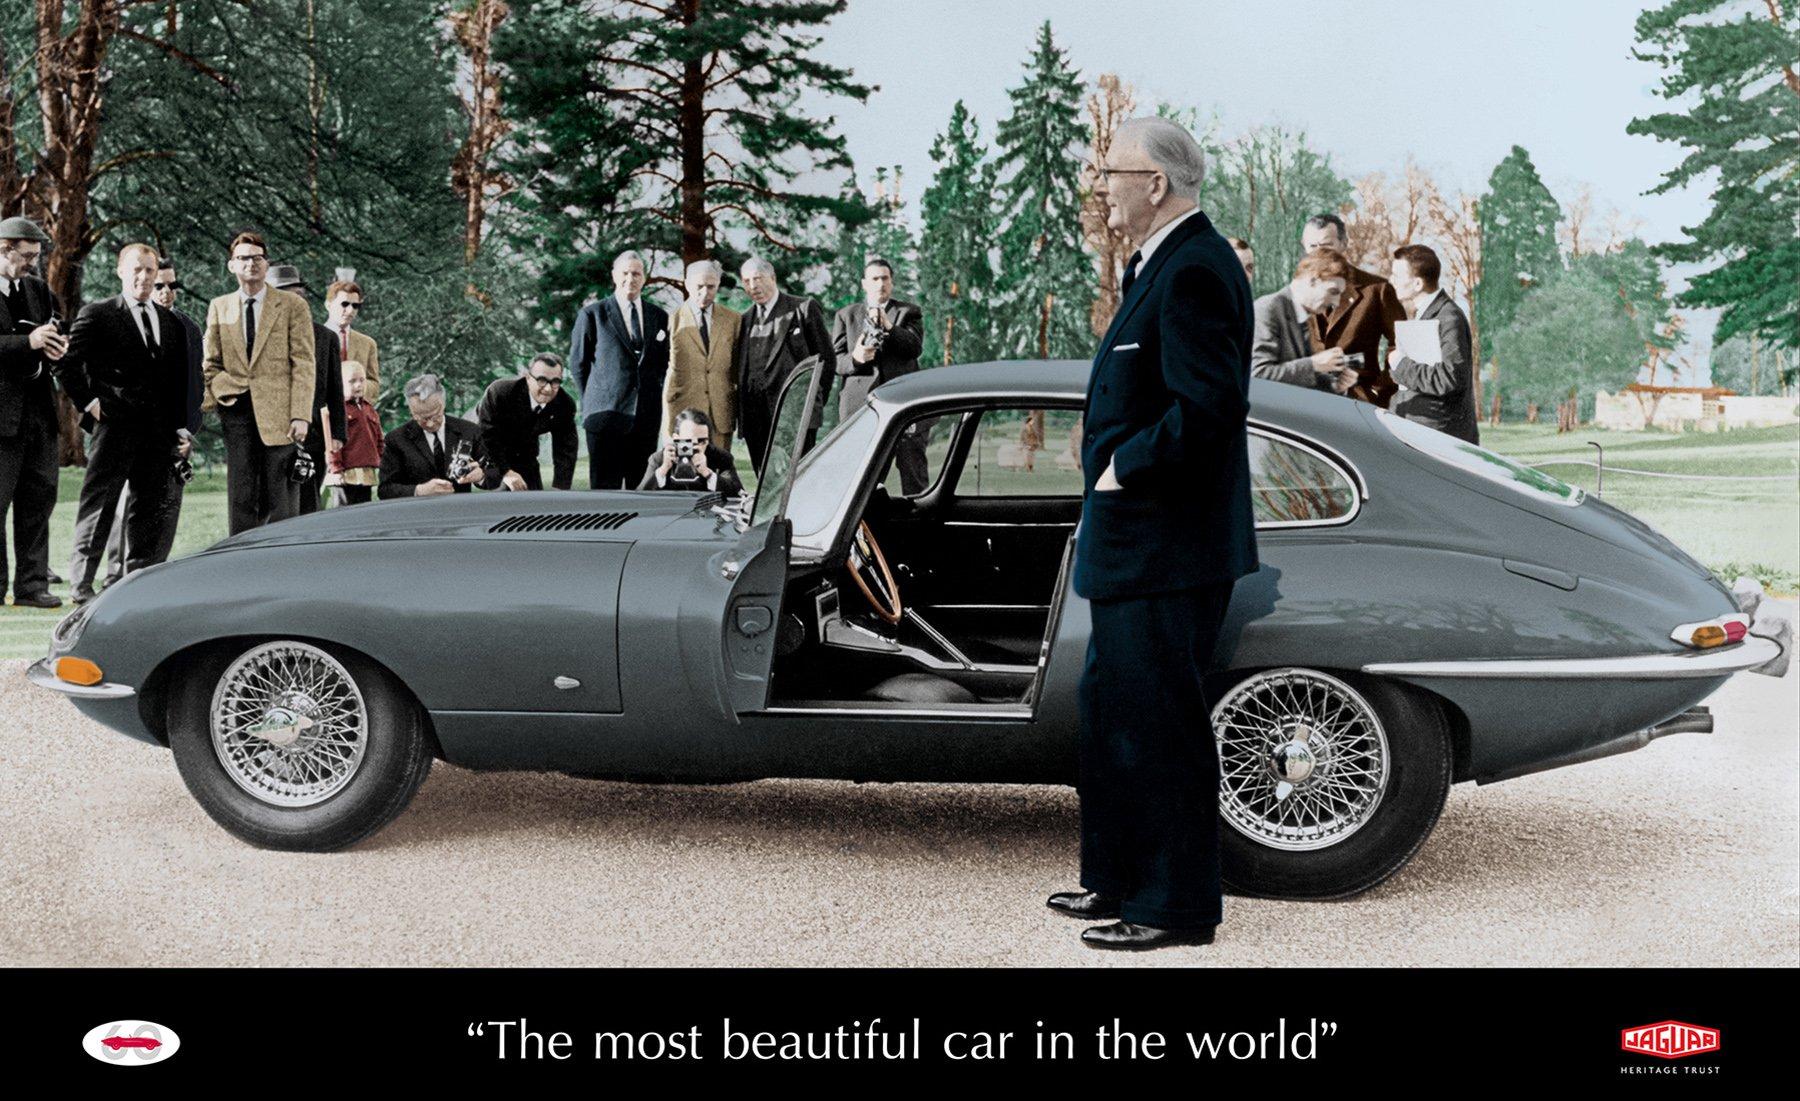 Jaguar E-Type Lead Image History Talk